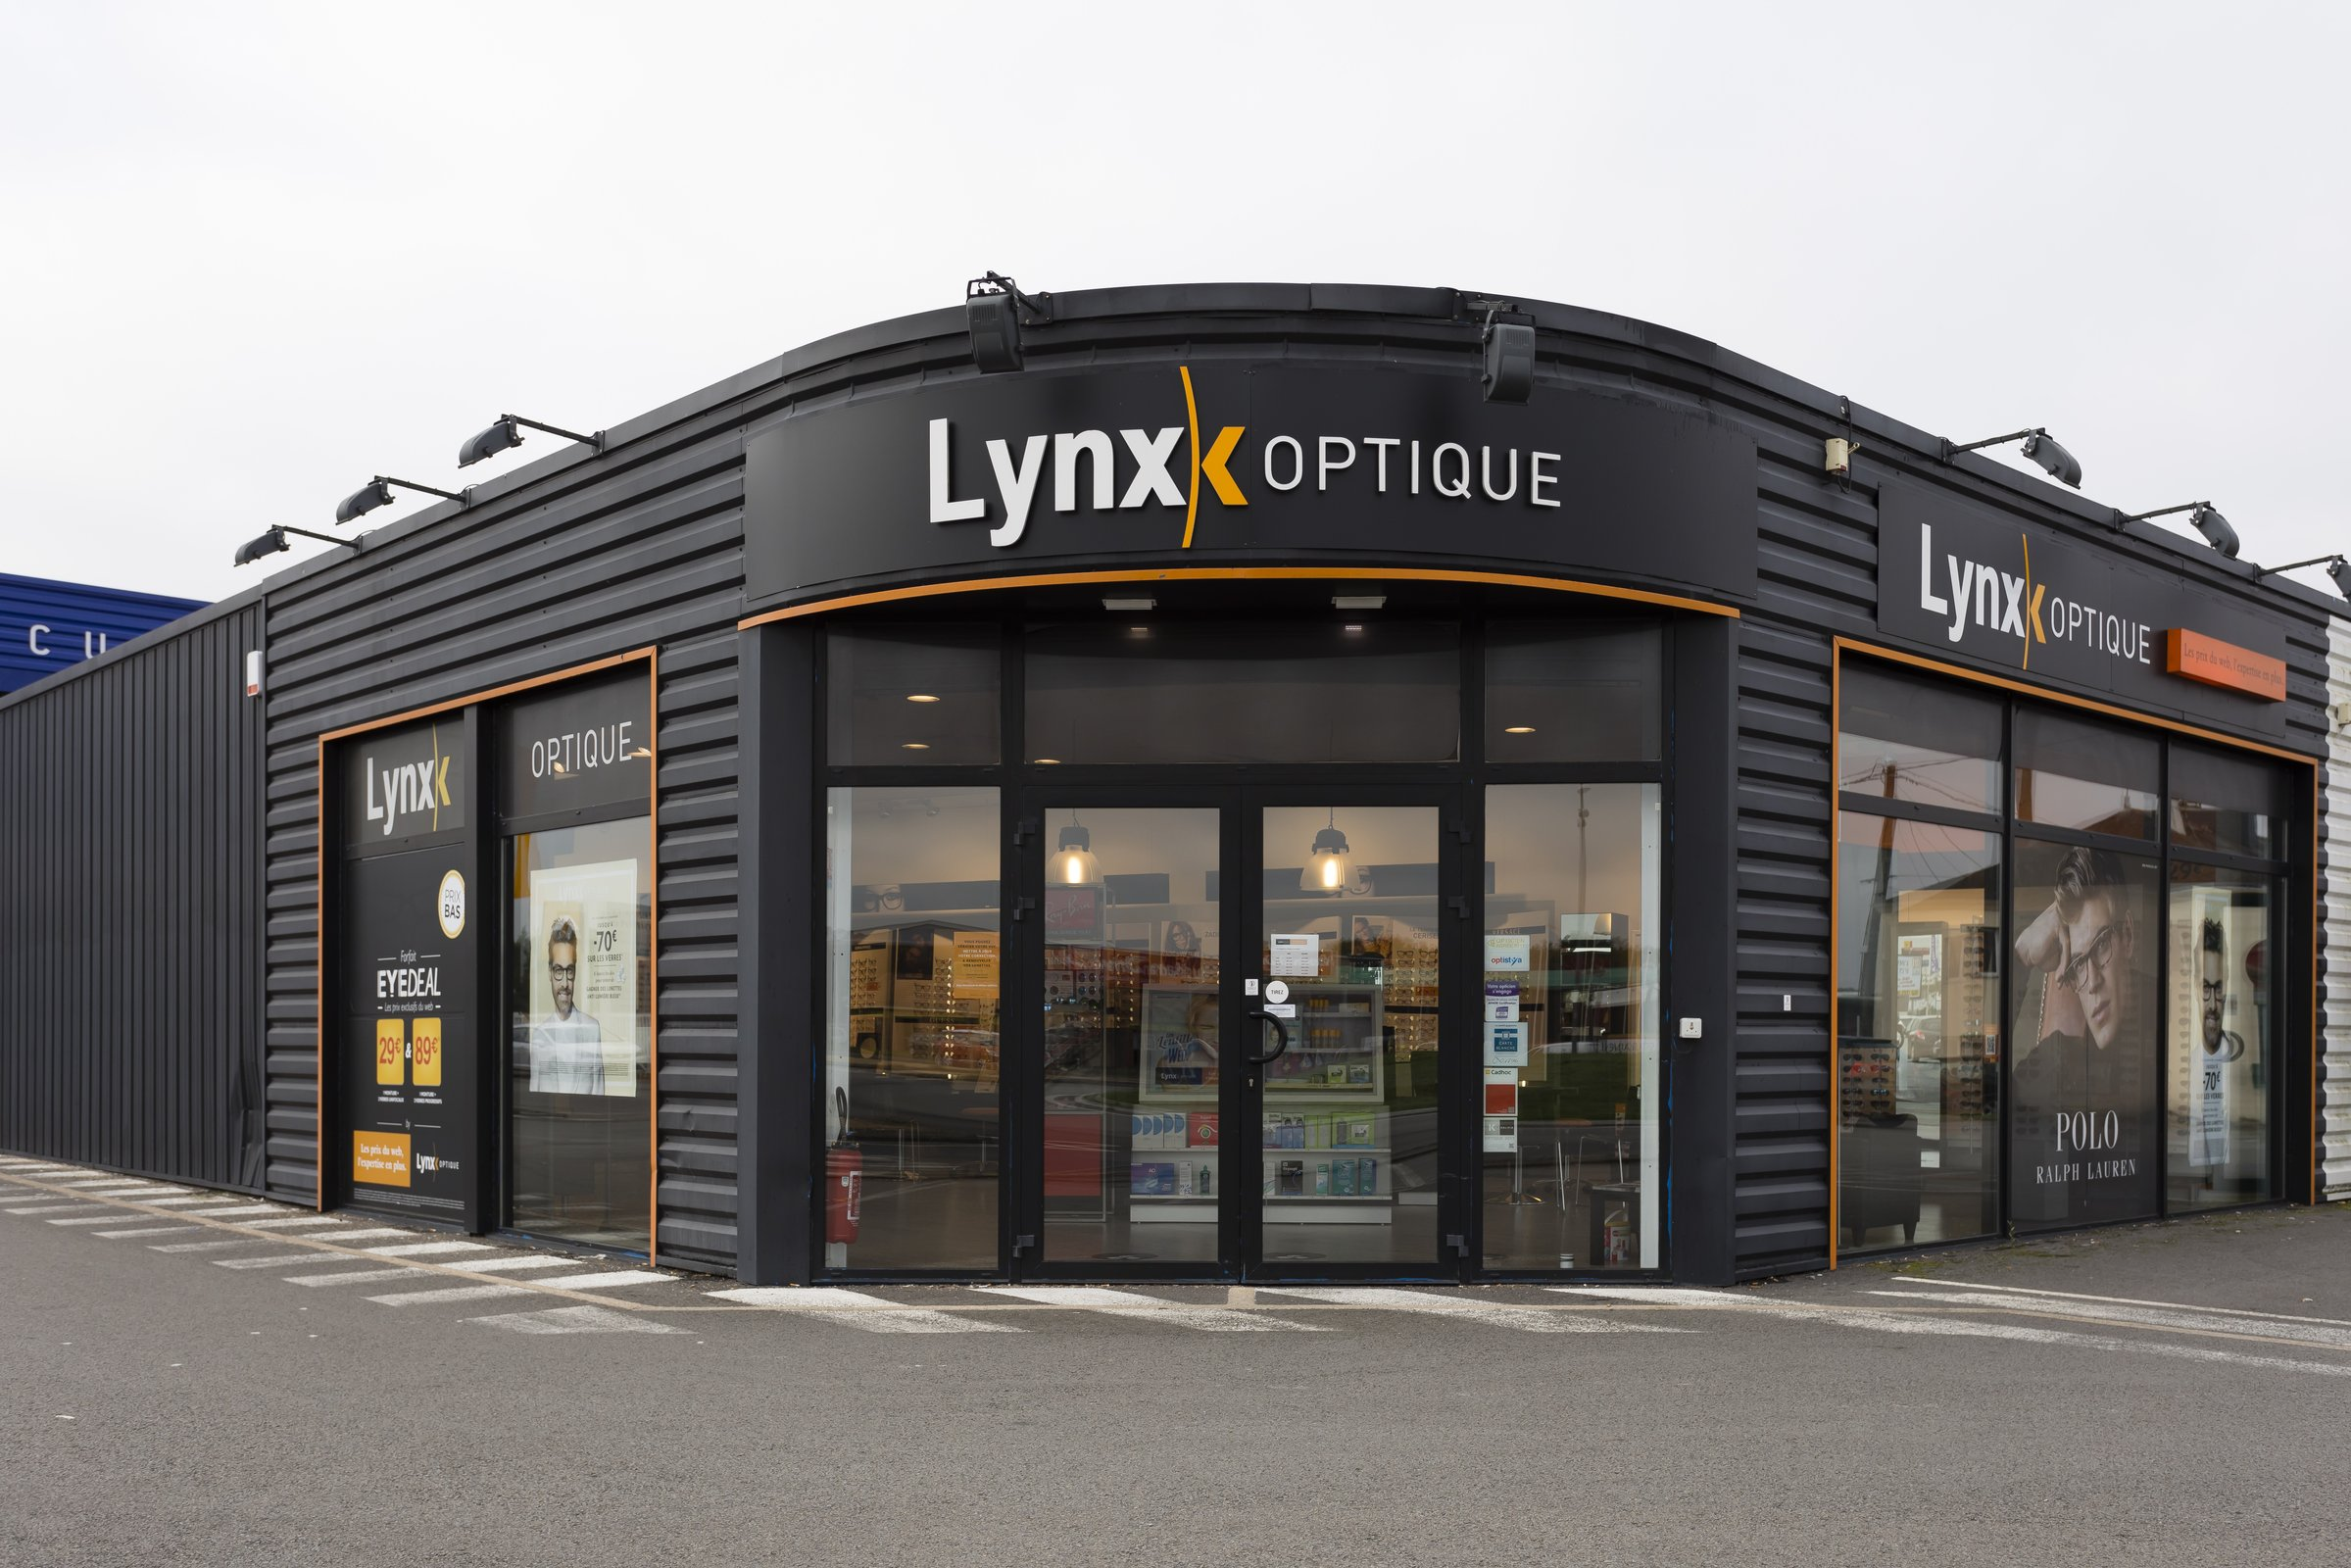 Lynx Optique Vertou